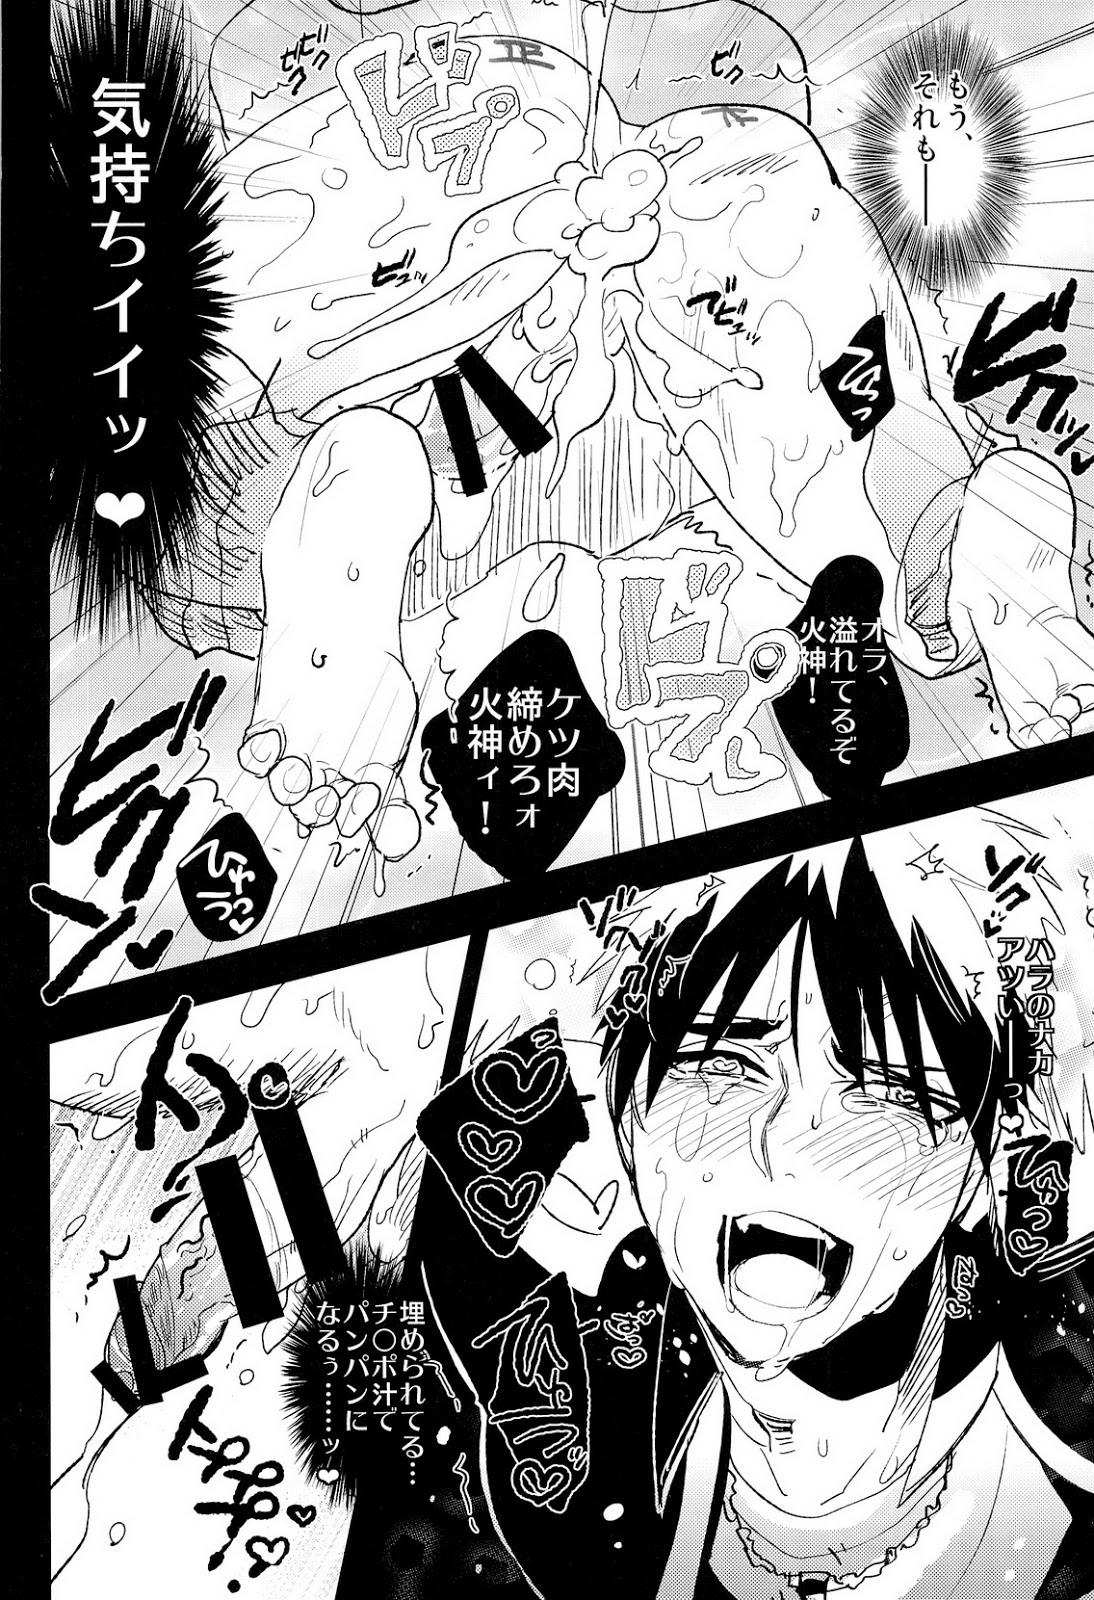 Kabejiri Hon - DK Fuck 25